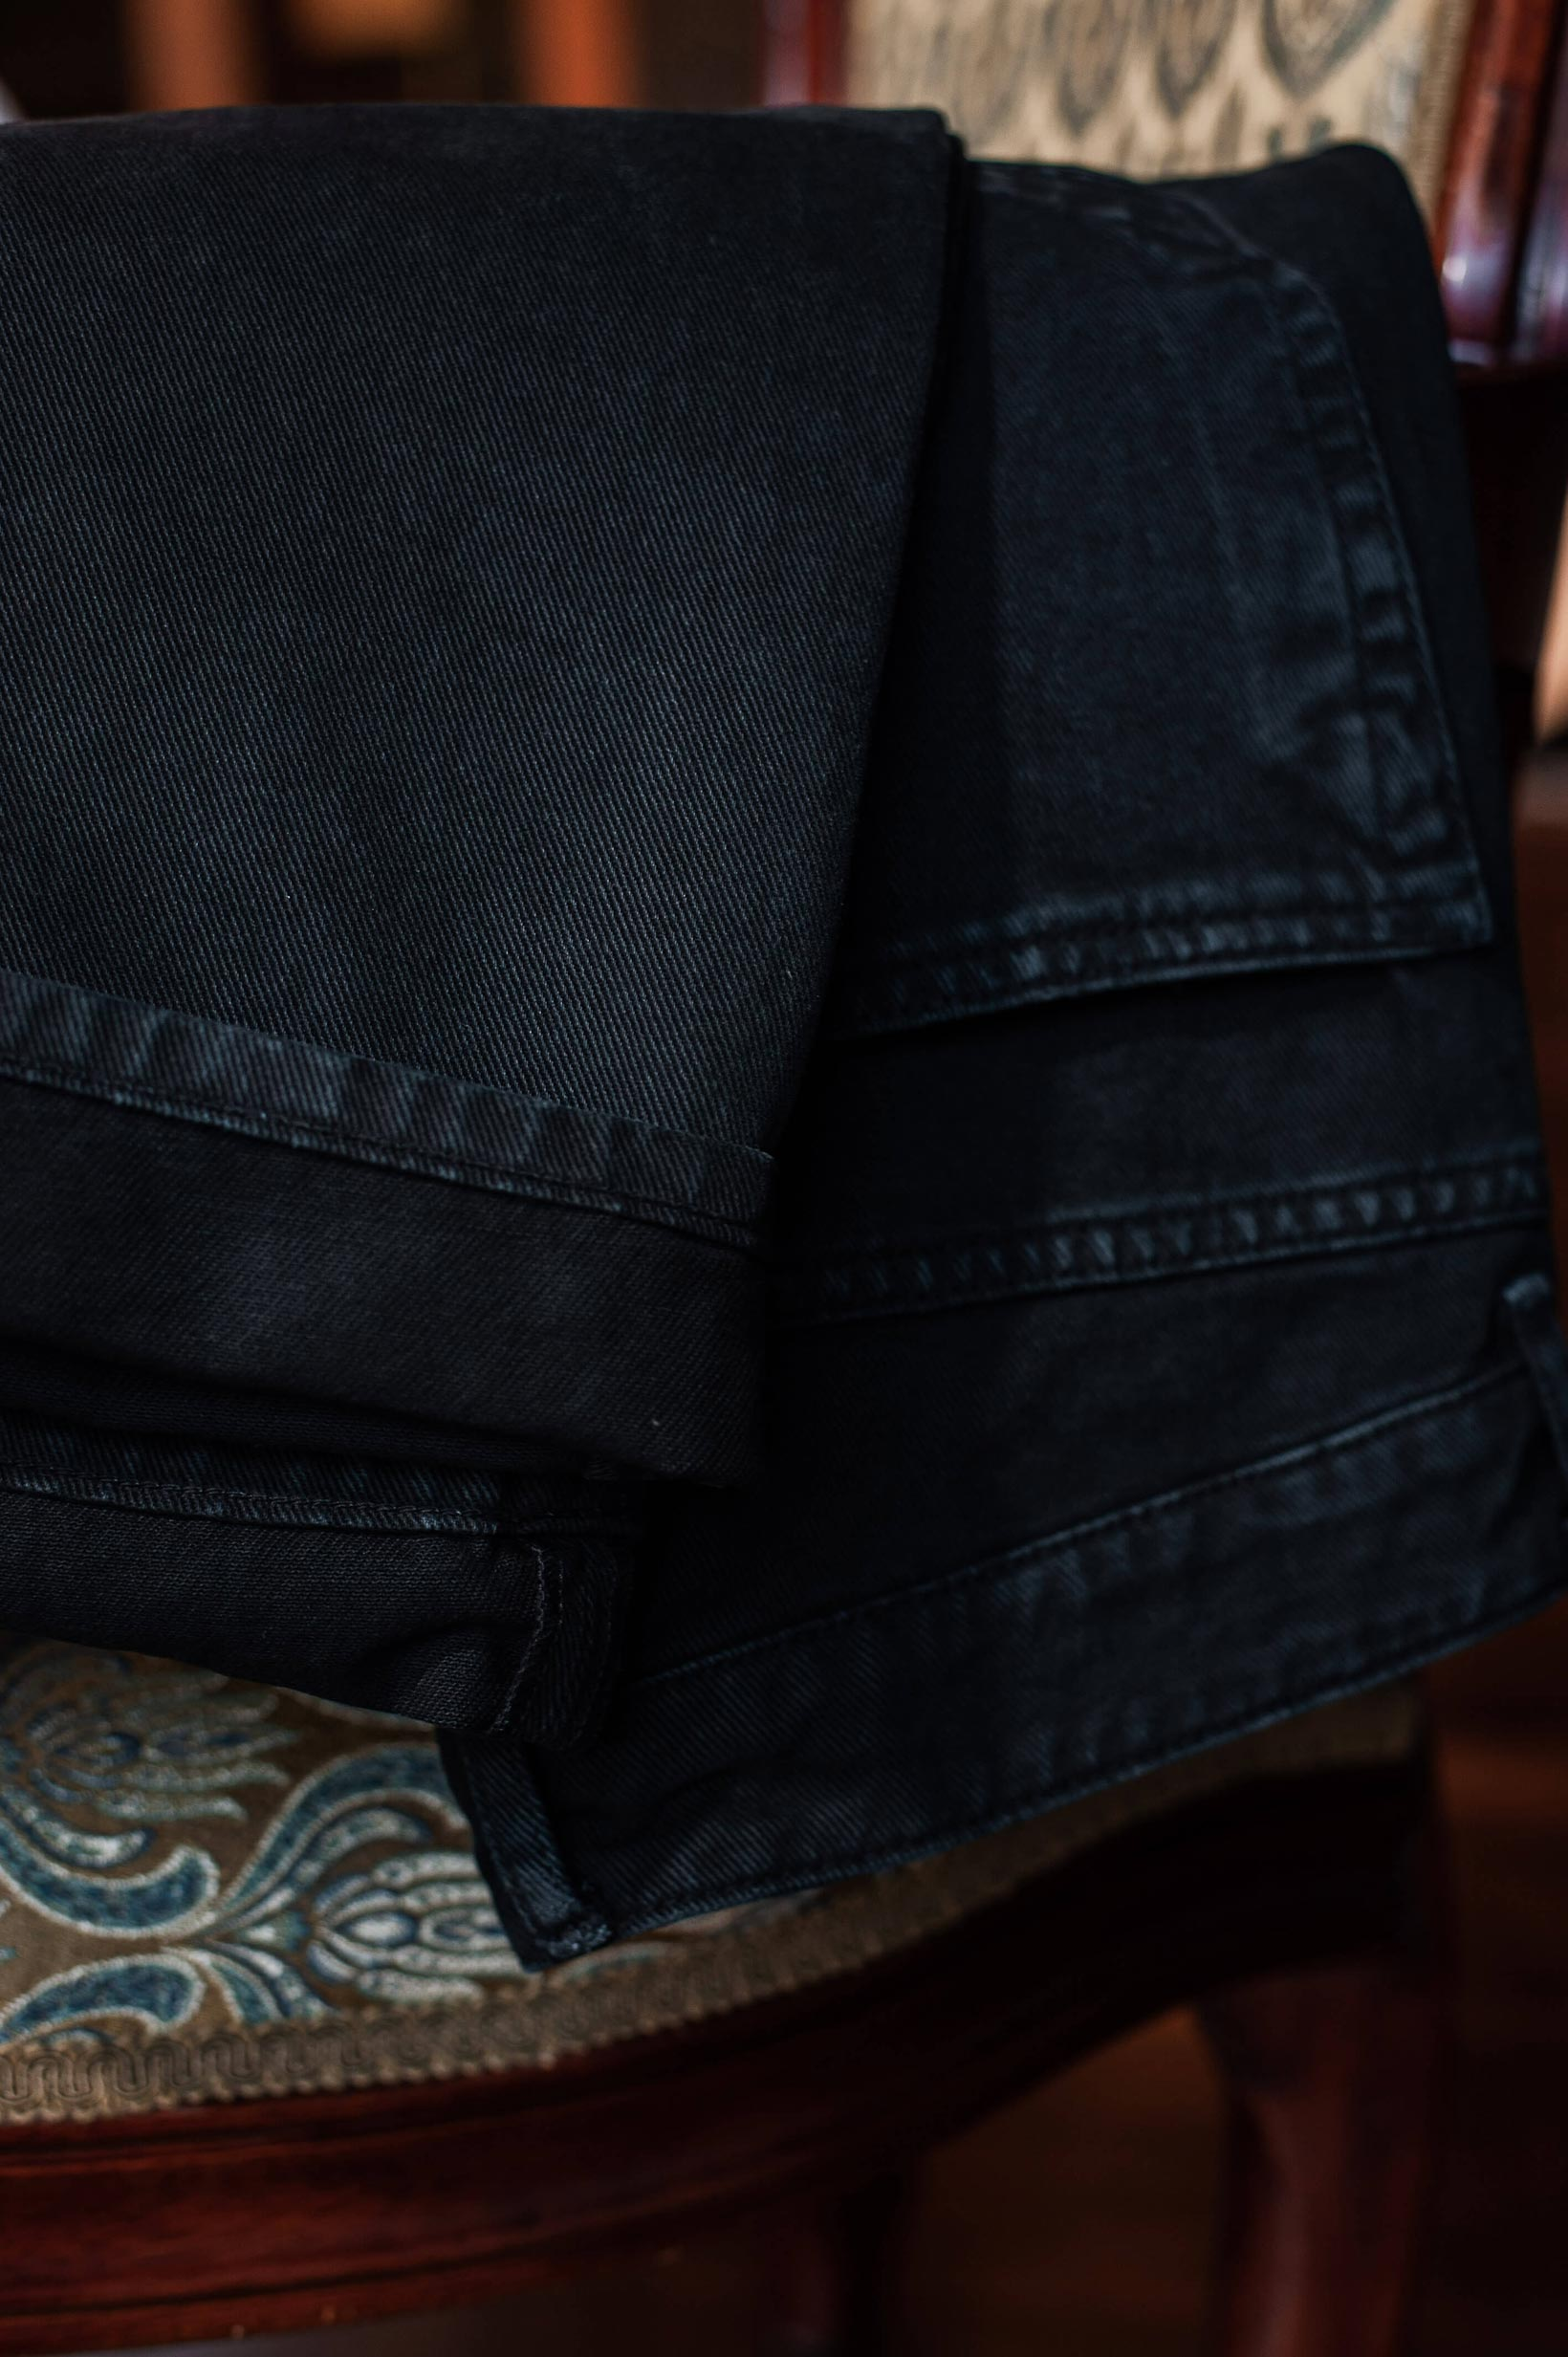 Rick Owens DRKSHDW Torrance Jeans - Garment Dyed Black - Image 21